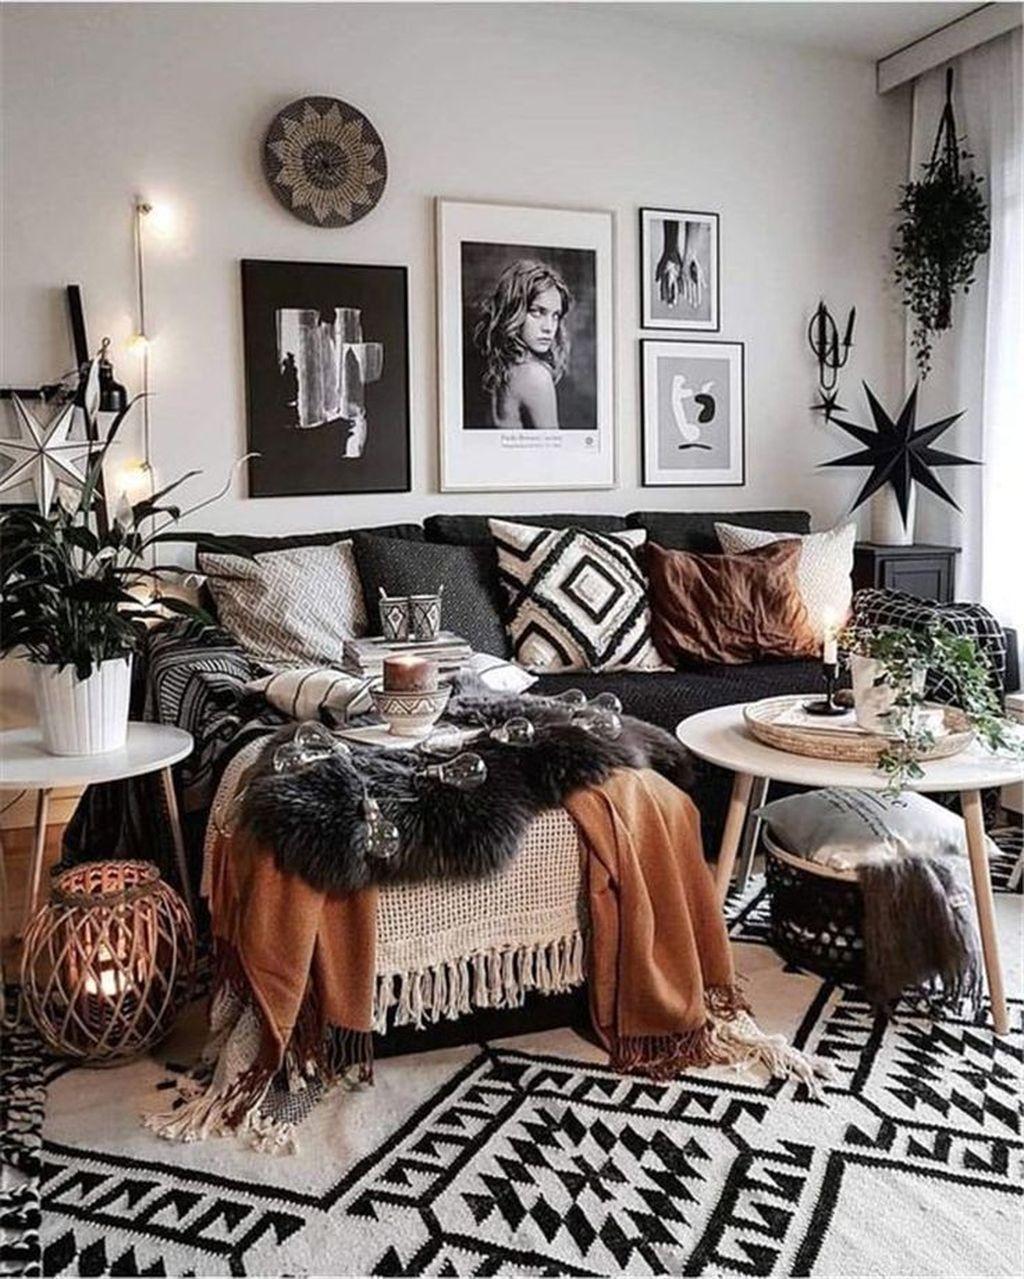 34 The Best Rustic Bohemian Living Room Decor Ideas In 2020 Bohemian Living Room Decor Black And White Living Room Decor Black And White Living Room